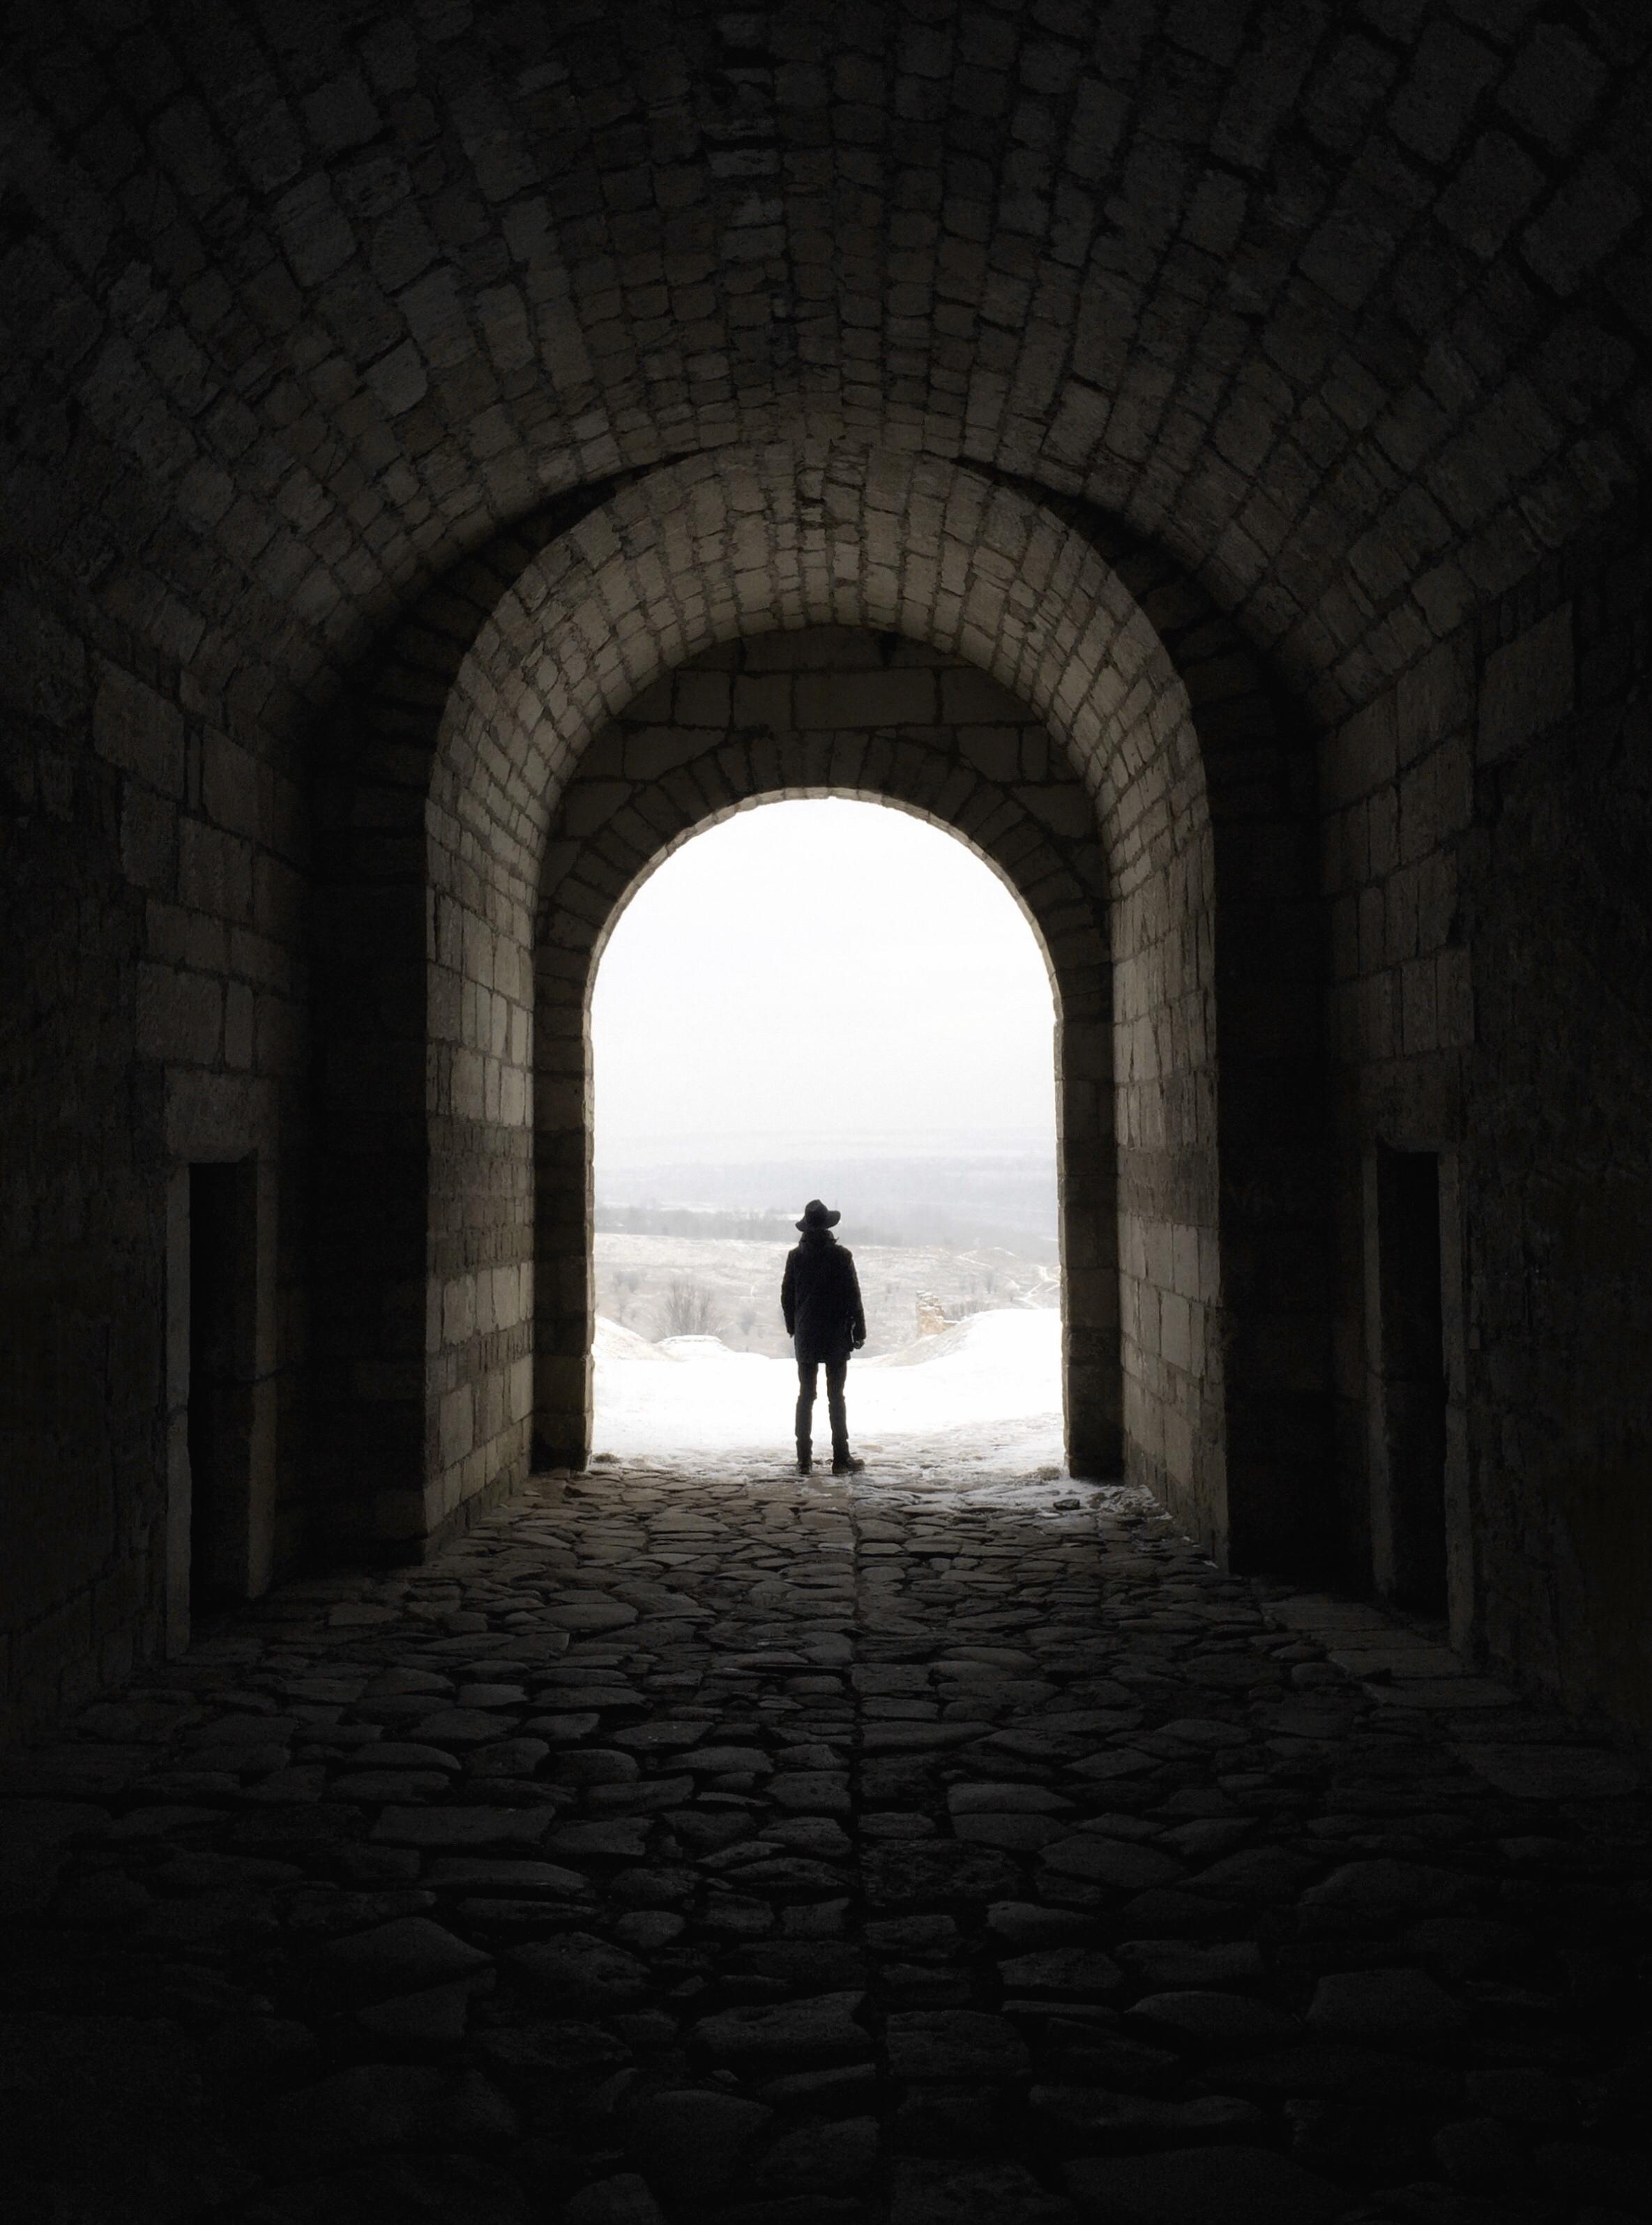 Black Galaxy Wallpaper Hd Greyscale Photography Of Man Walking On Tunnel 183 Free